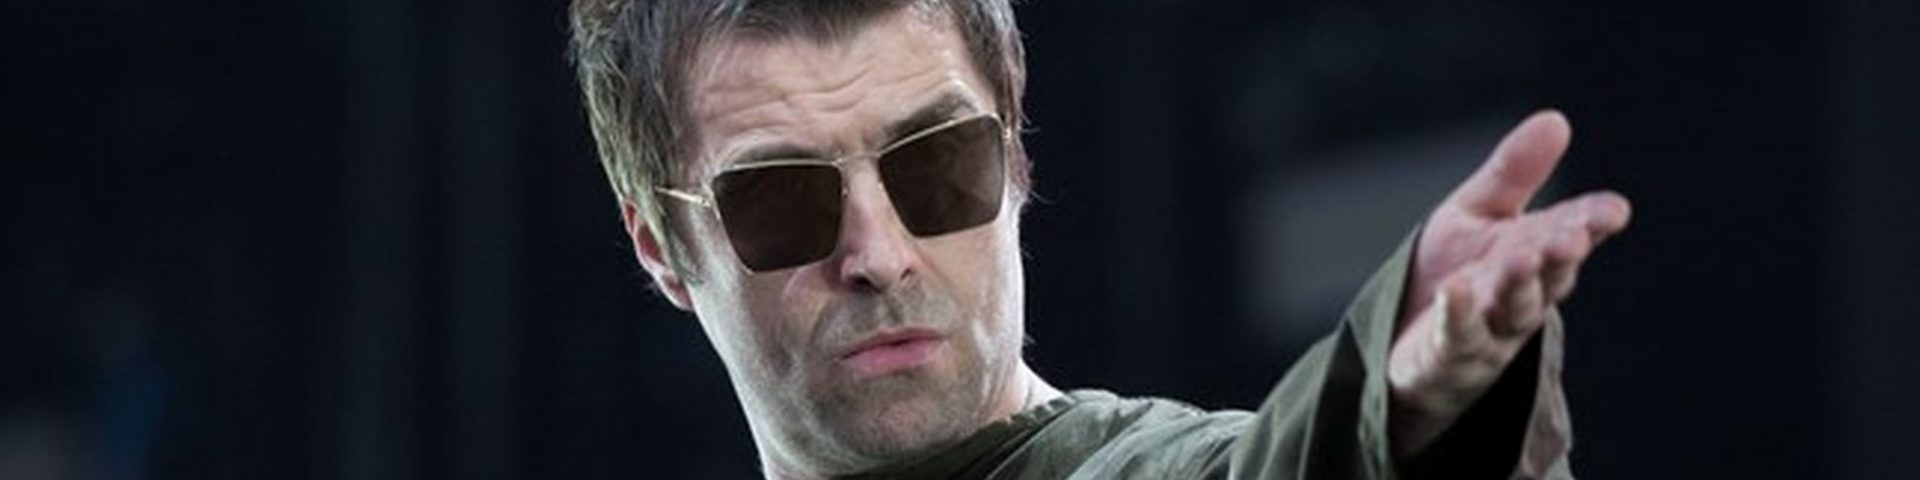 Liam Gallagher a Assago 16/02